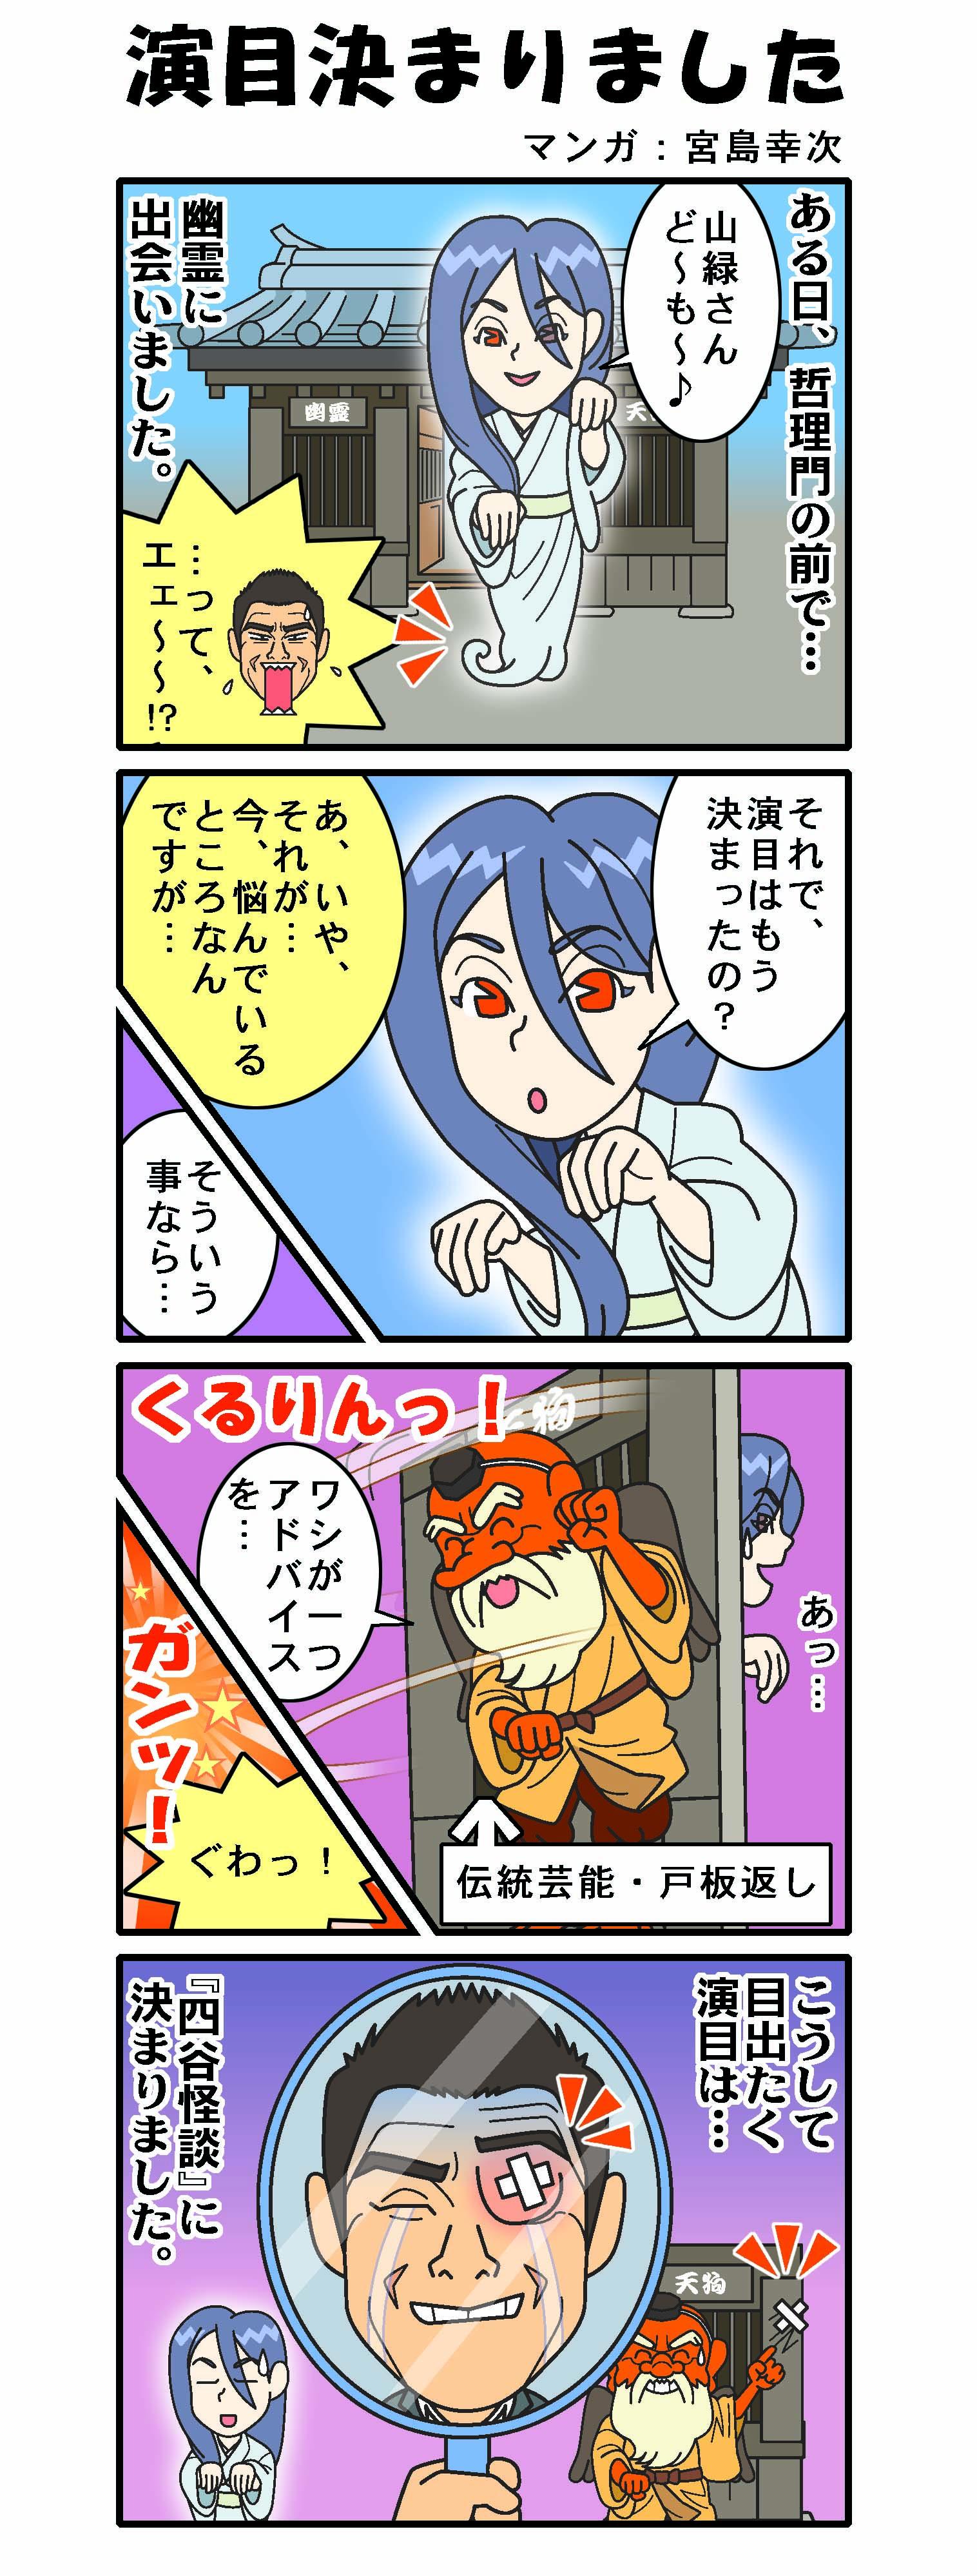 【特別企画 怪談の夕べ】第2回 [鍋島騒動]